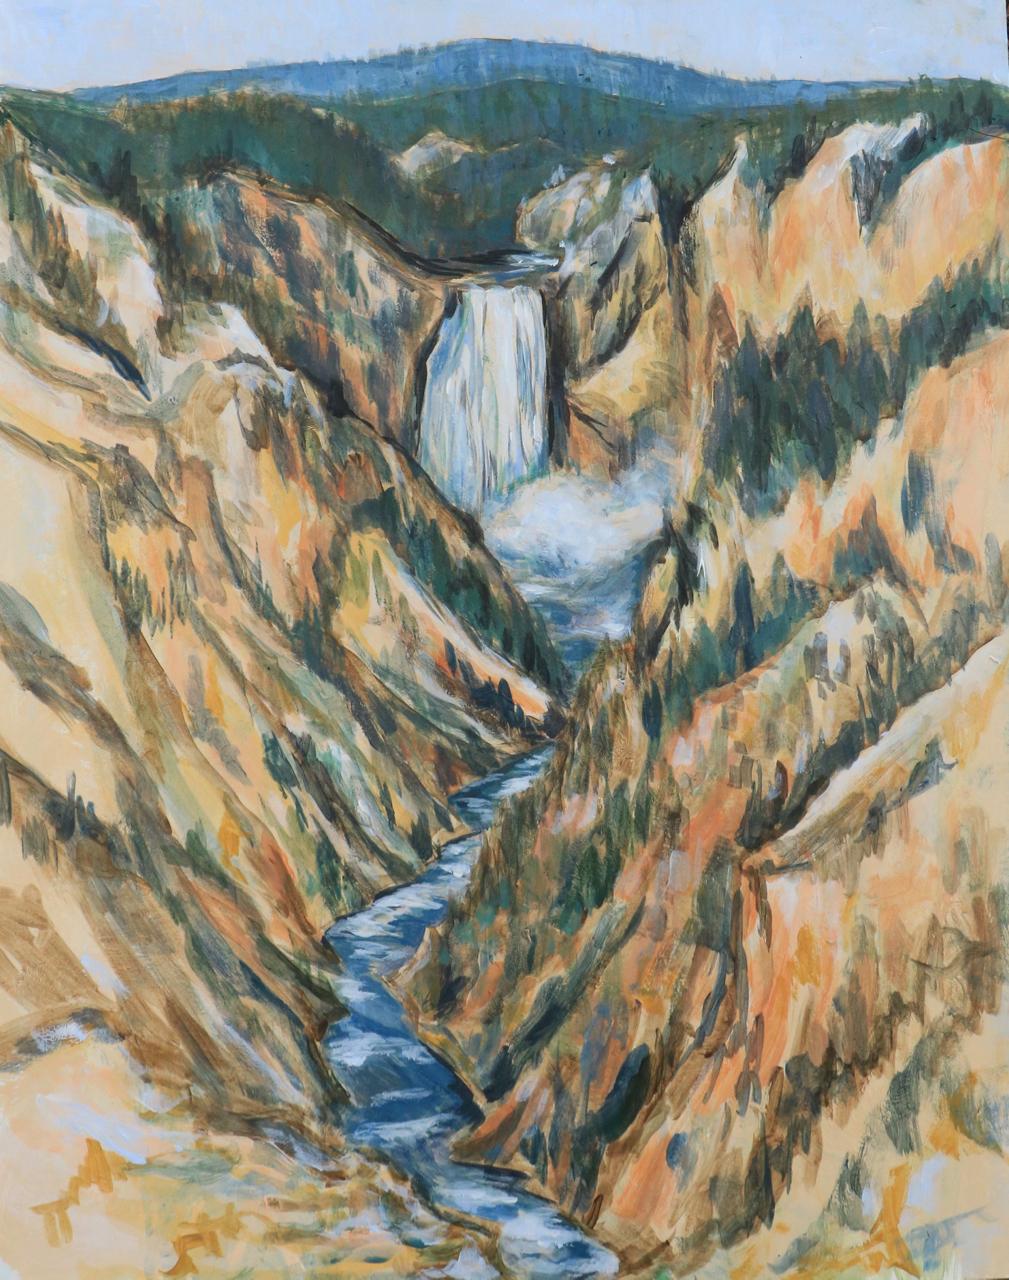 Lower Falls in the Morning, Yellowstone - acrylic on board